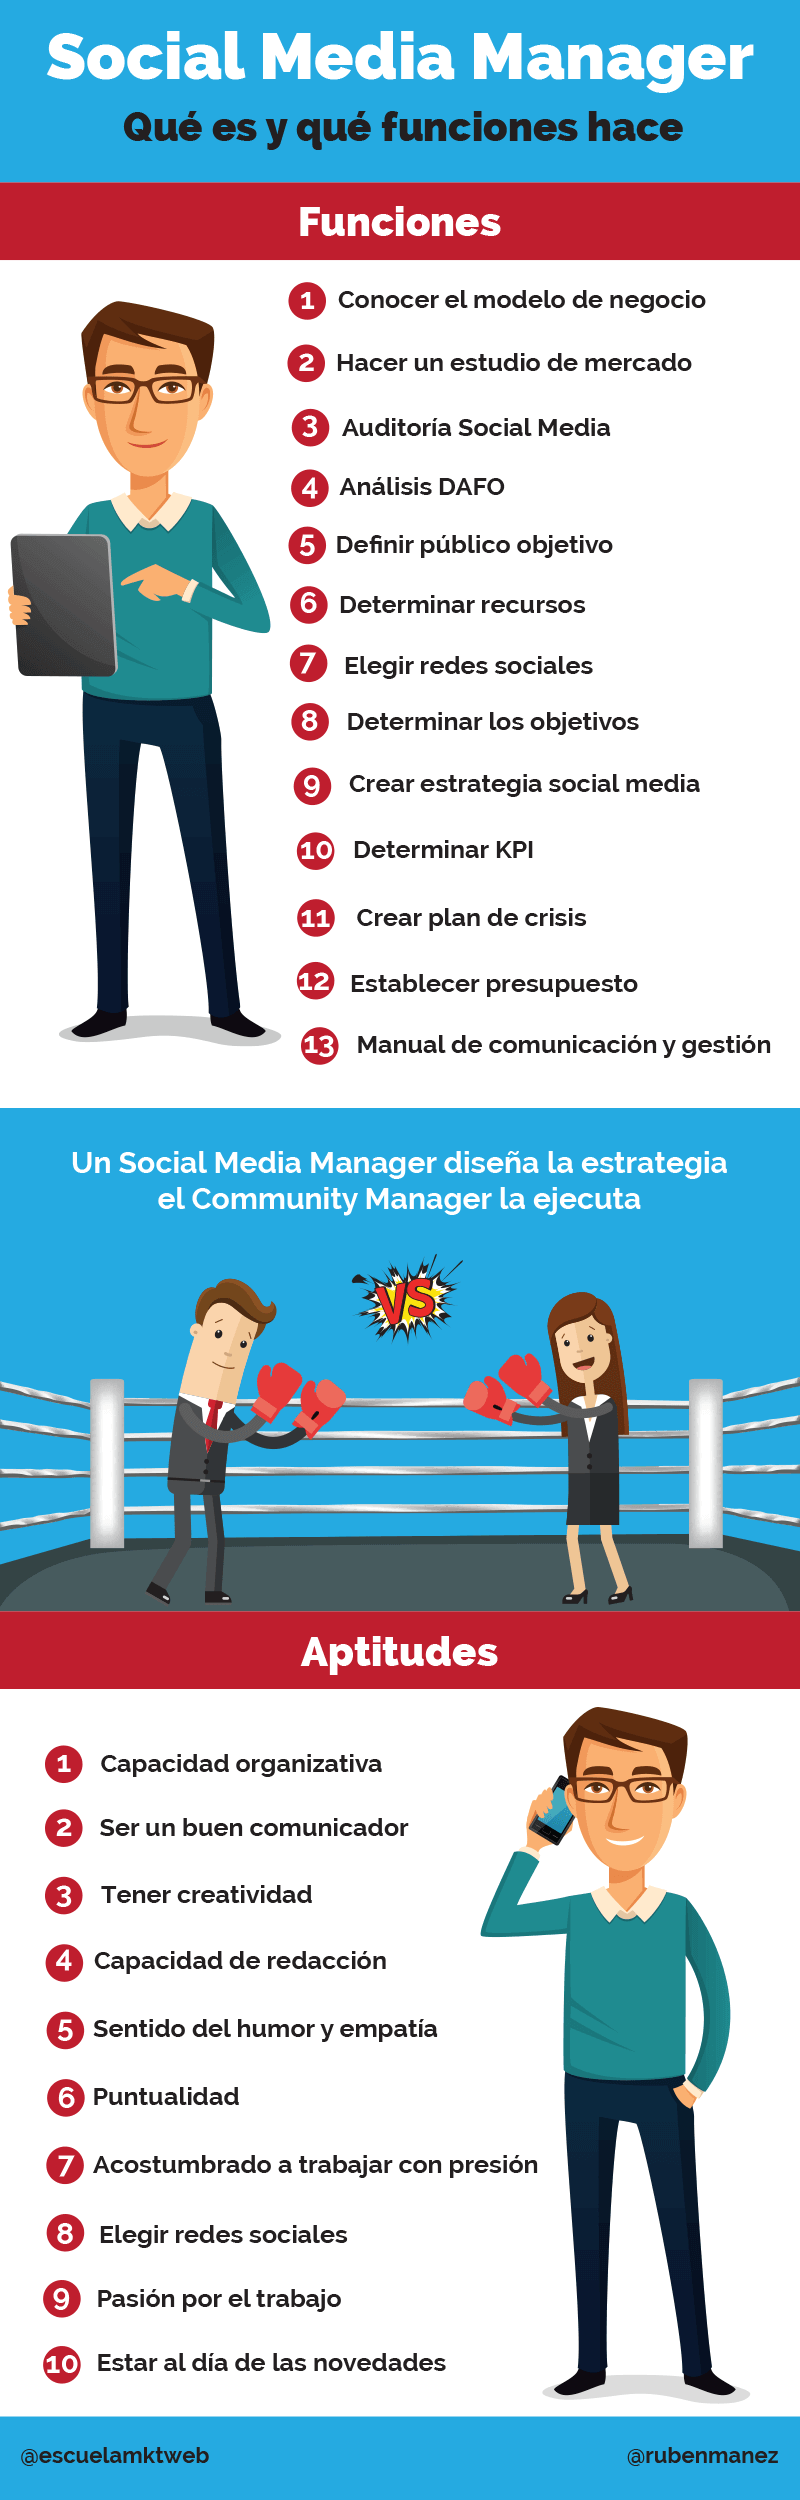 infografia social media manager